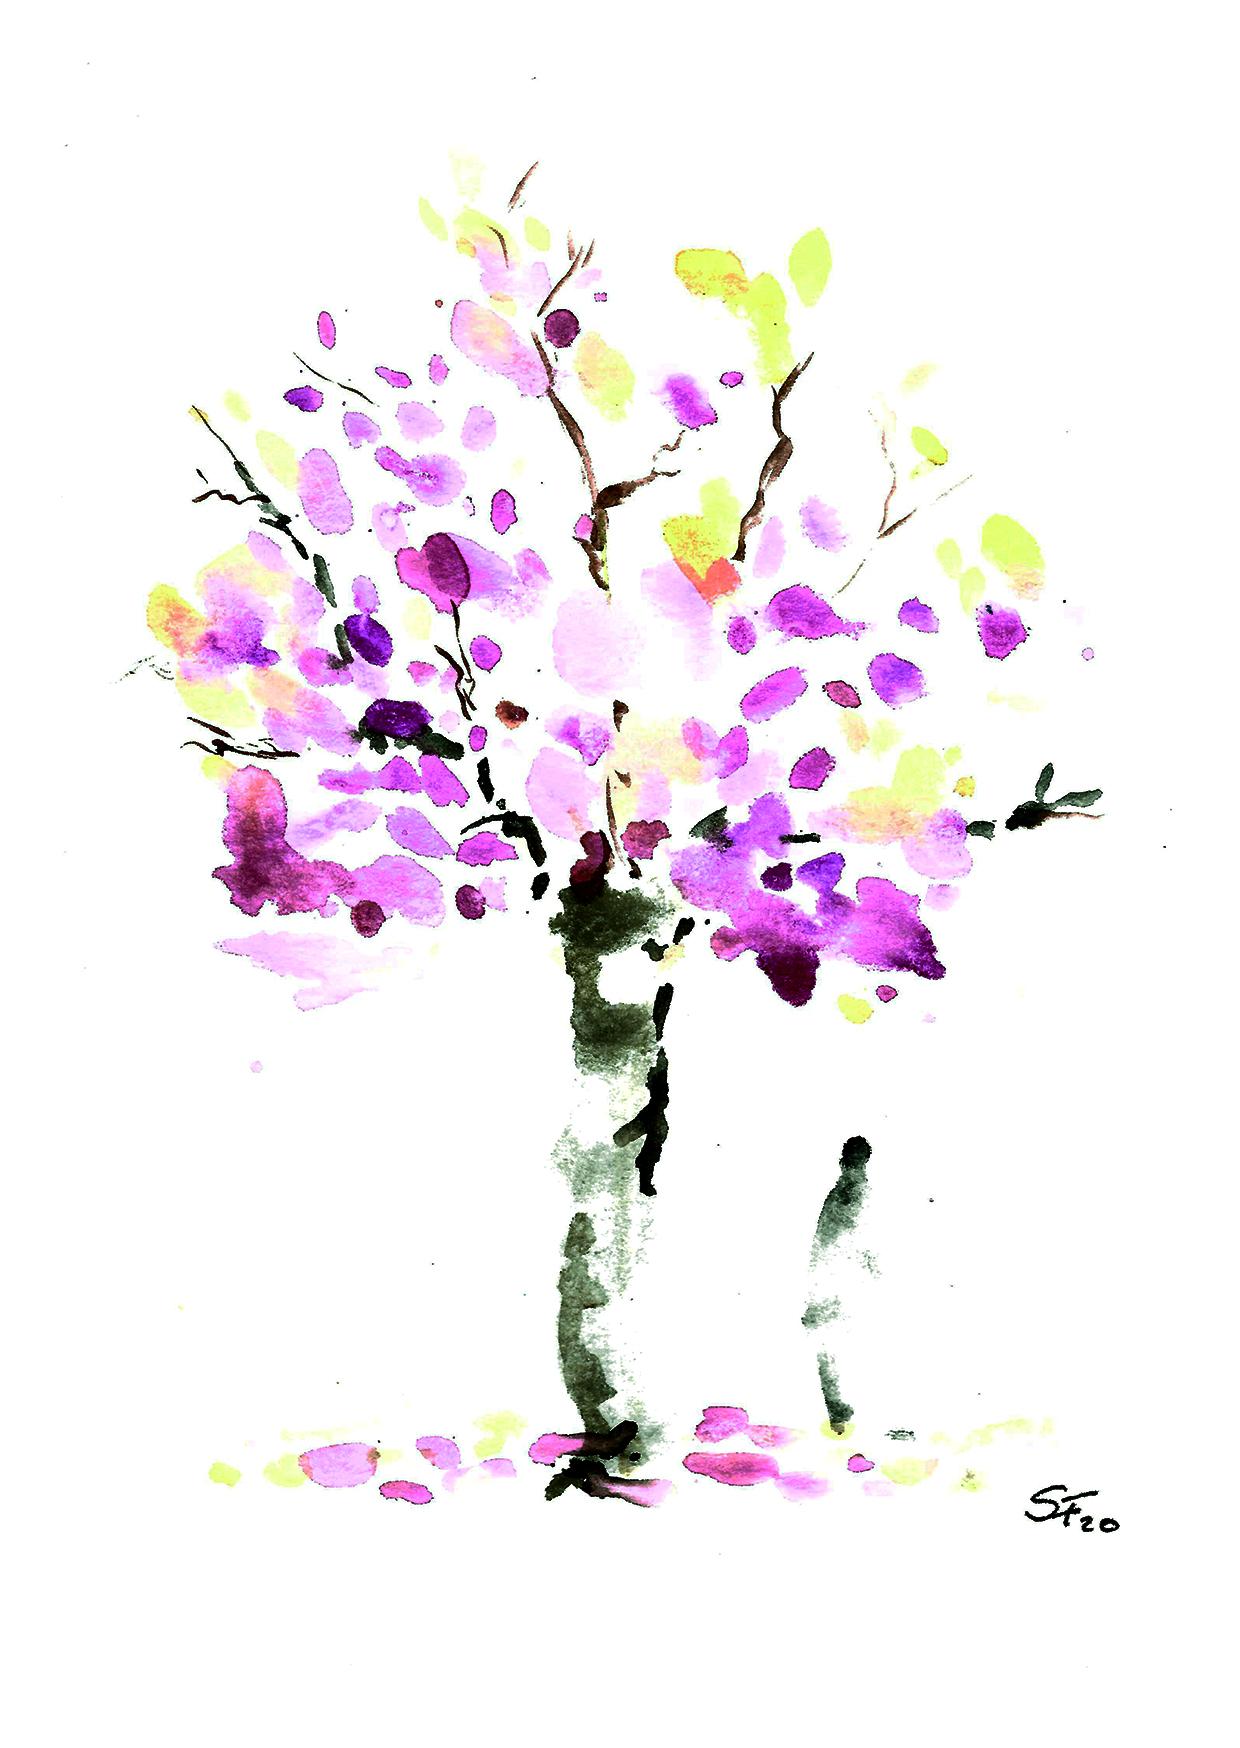 Aquarell Baum rosa Krone mit Person 03/20